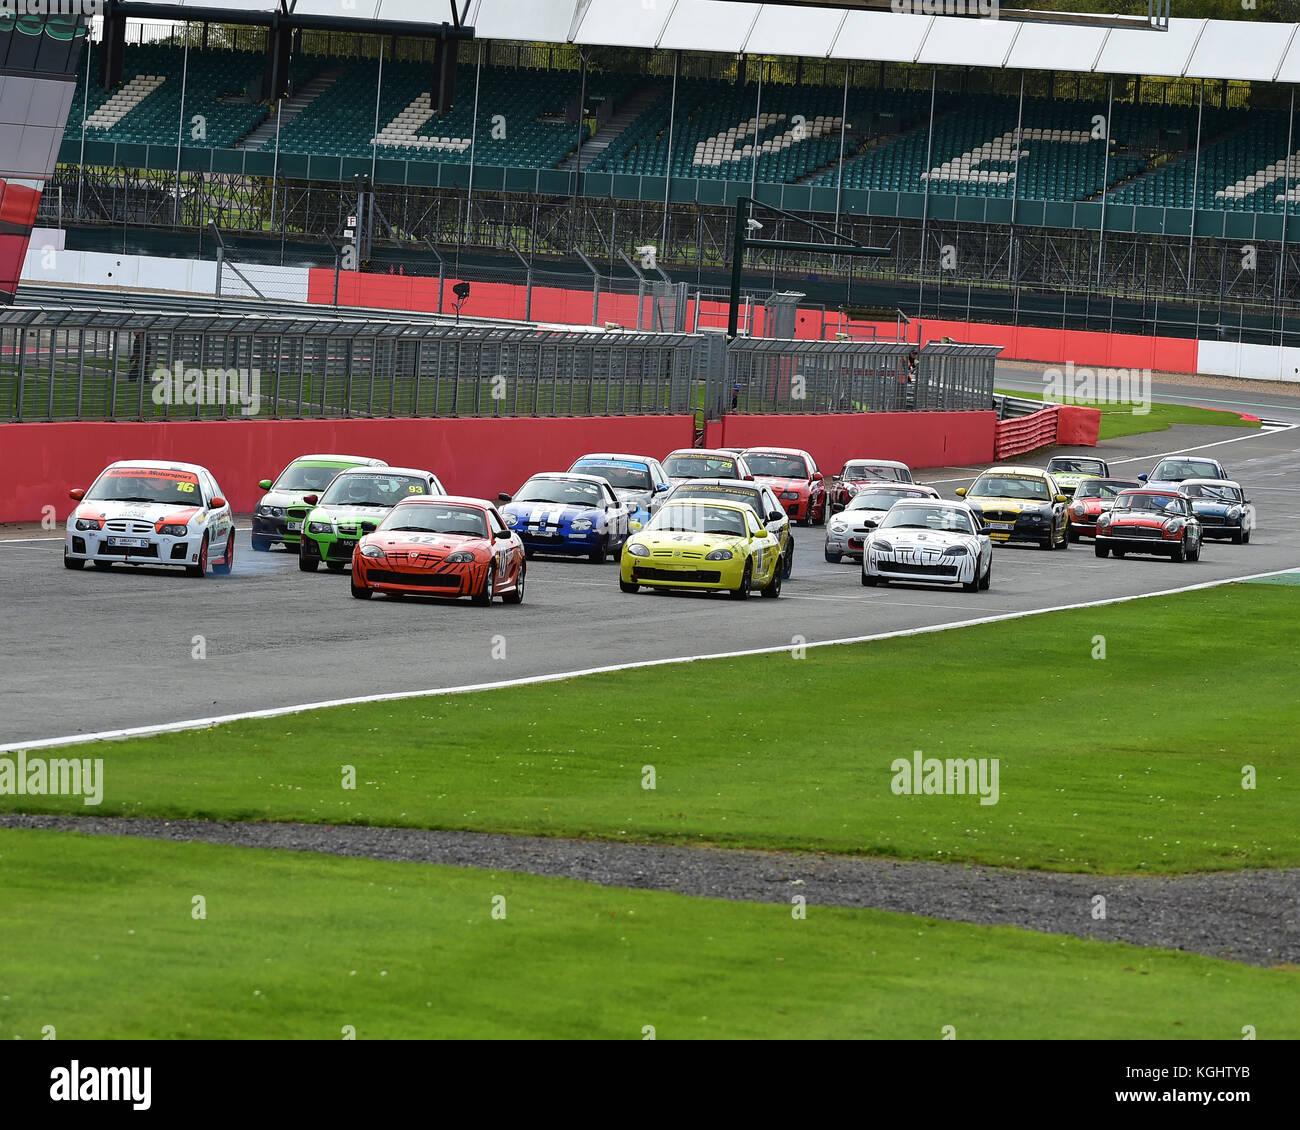 Morris garages cars stock photos morris garages cars for National motor club compensation plan